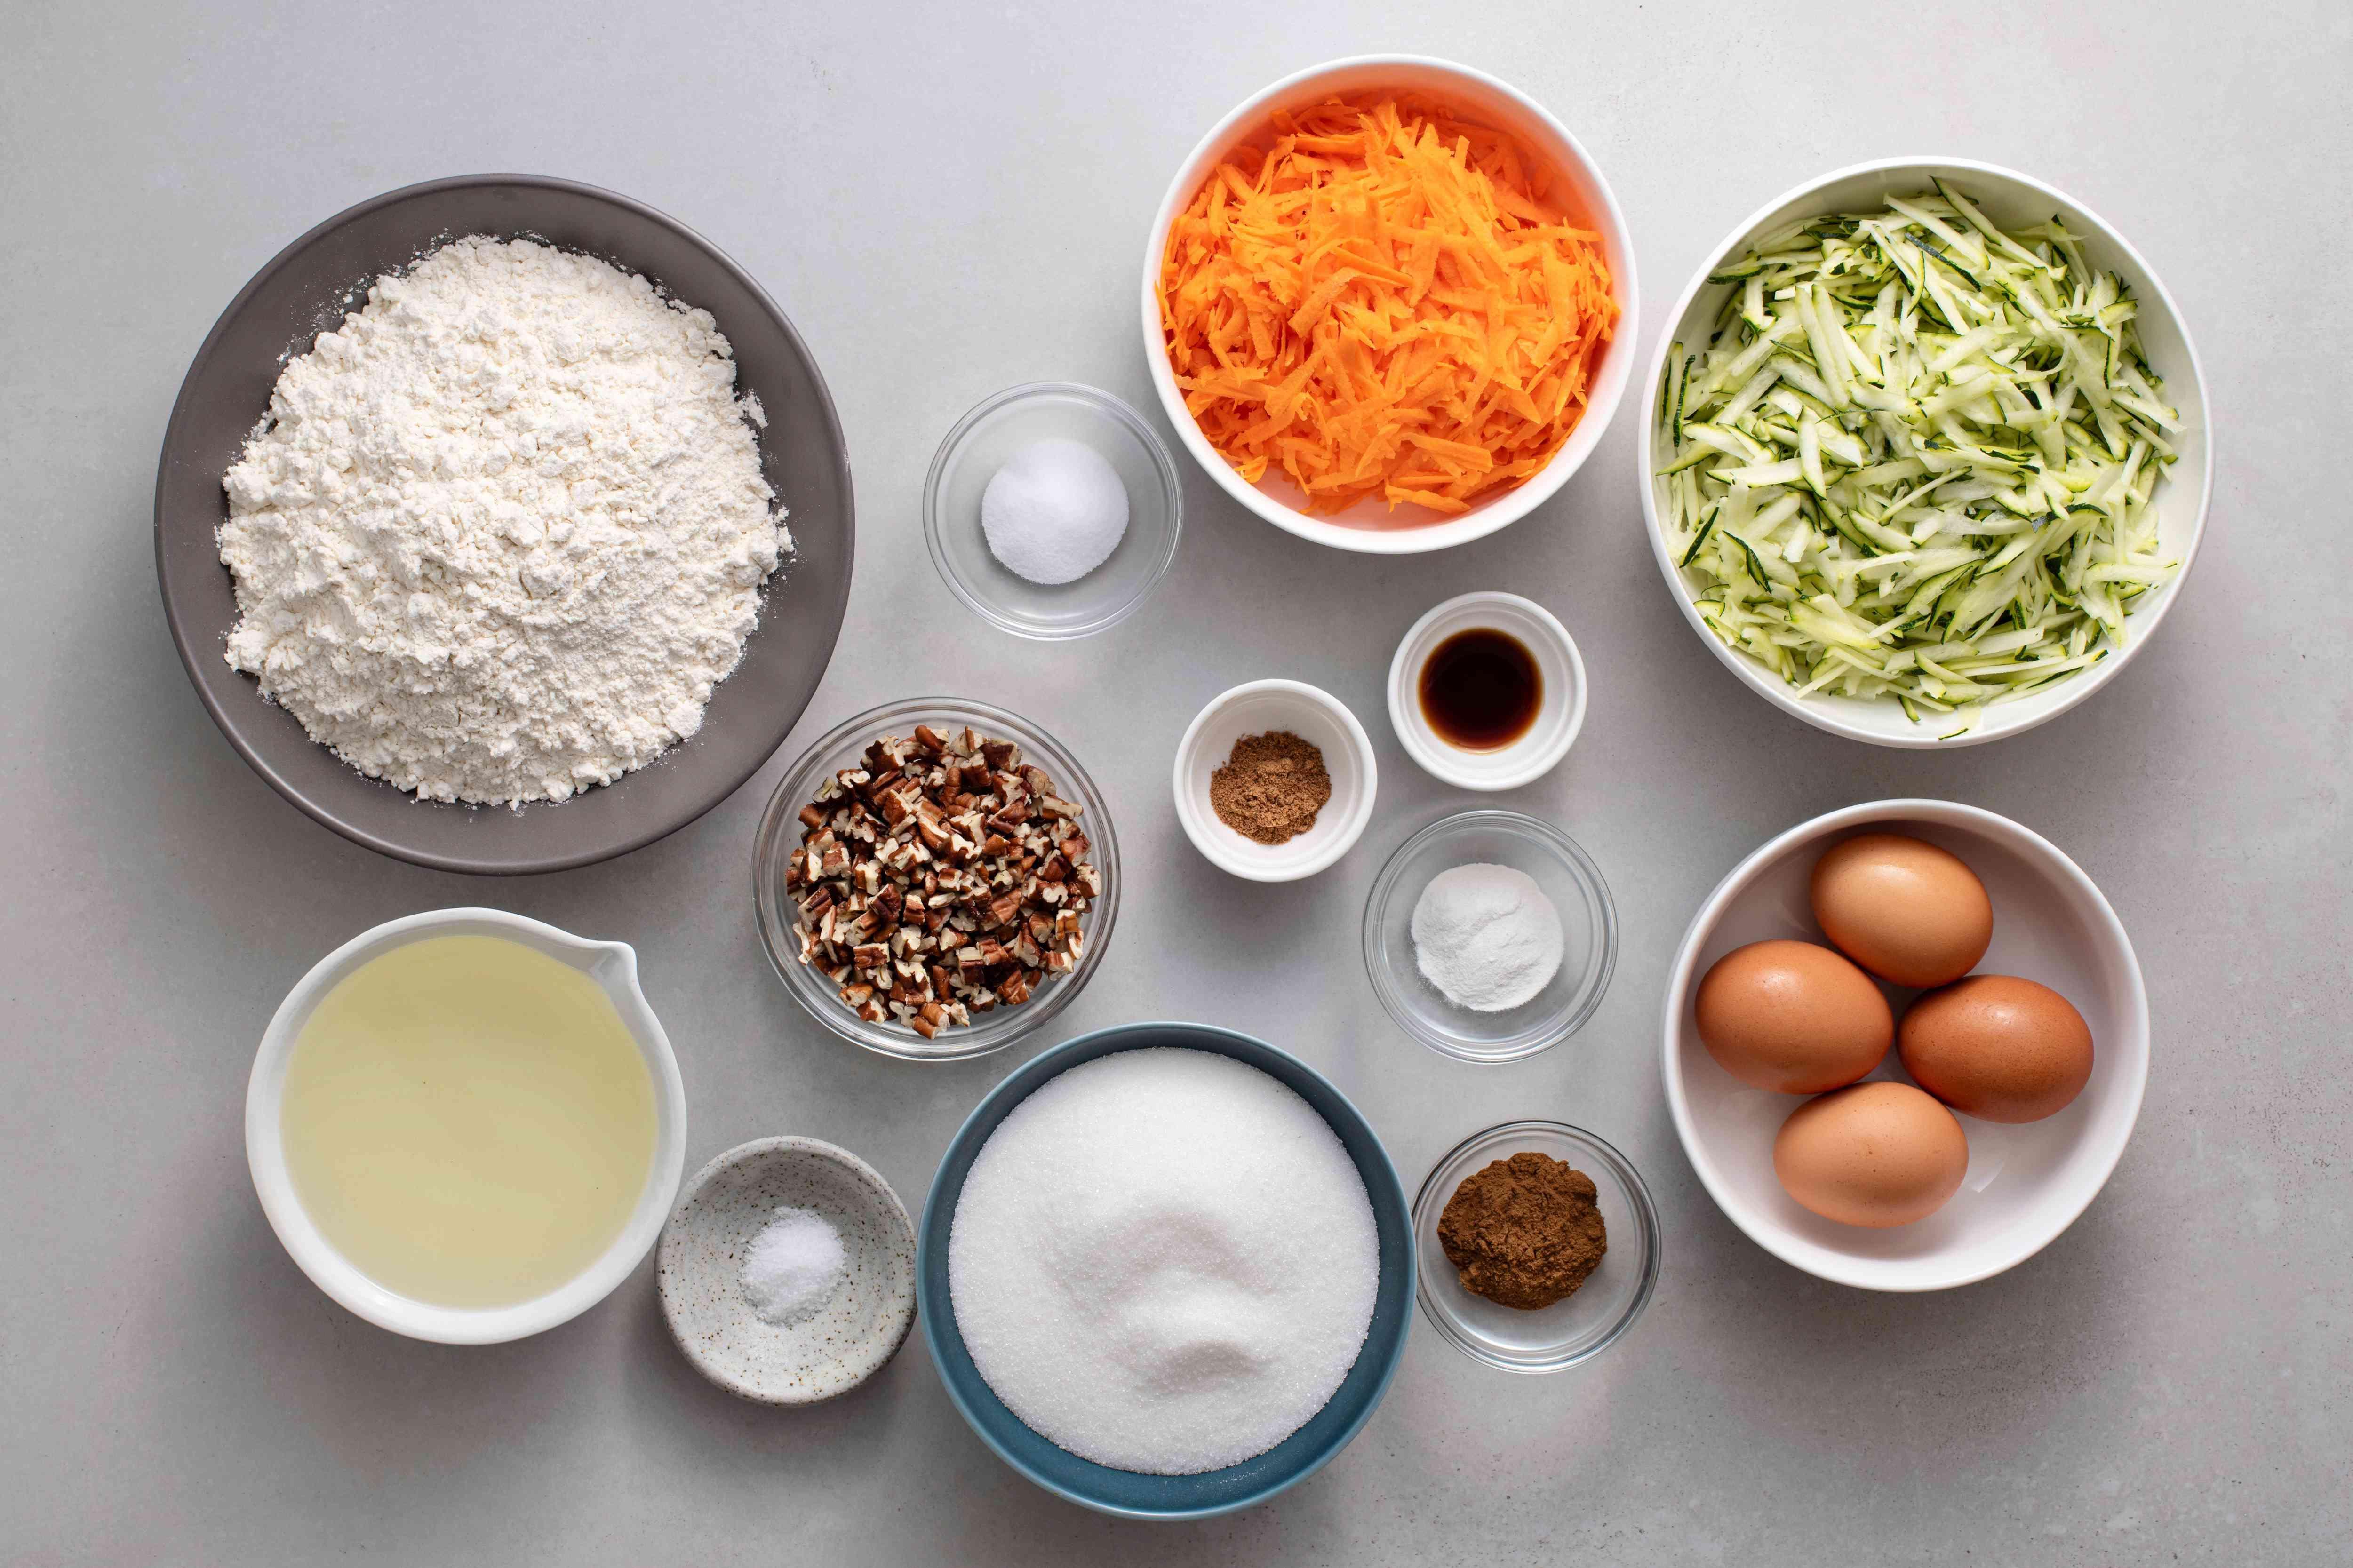 Zucchini Carrot Cake ingredients